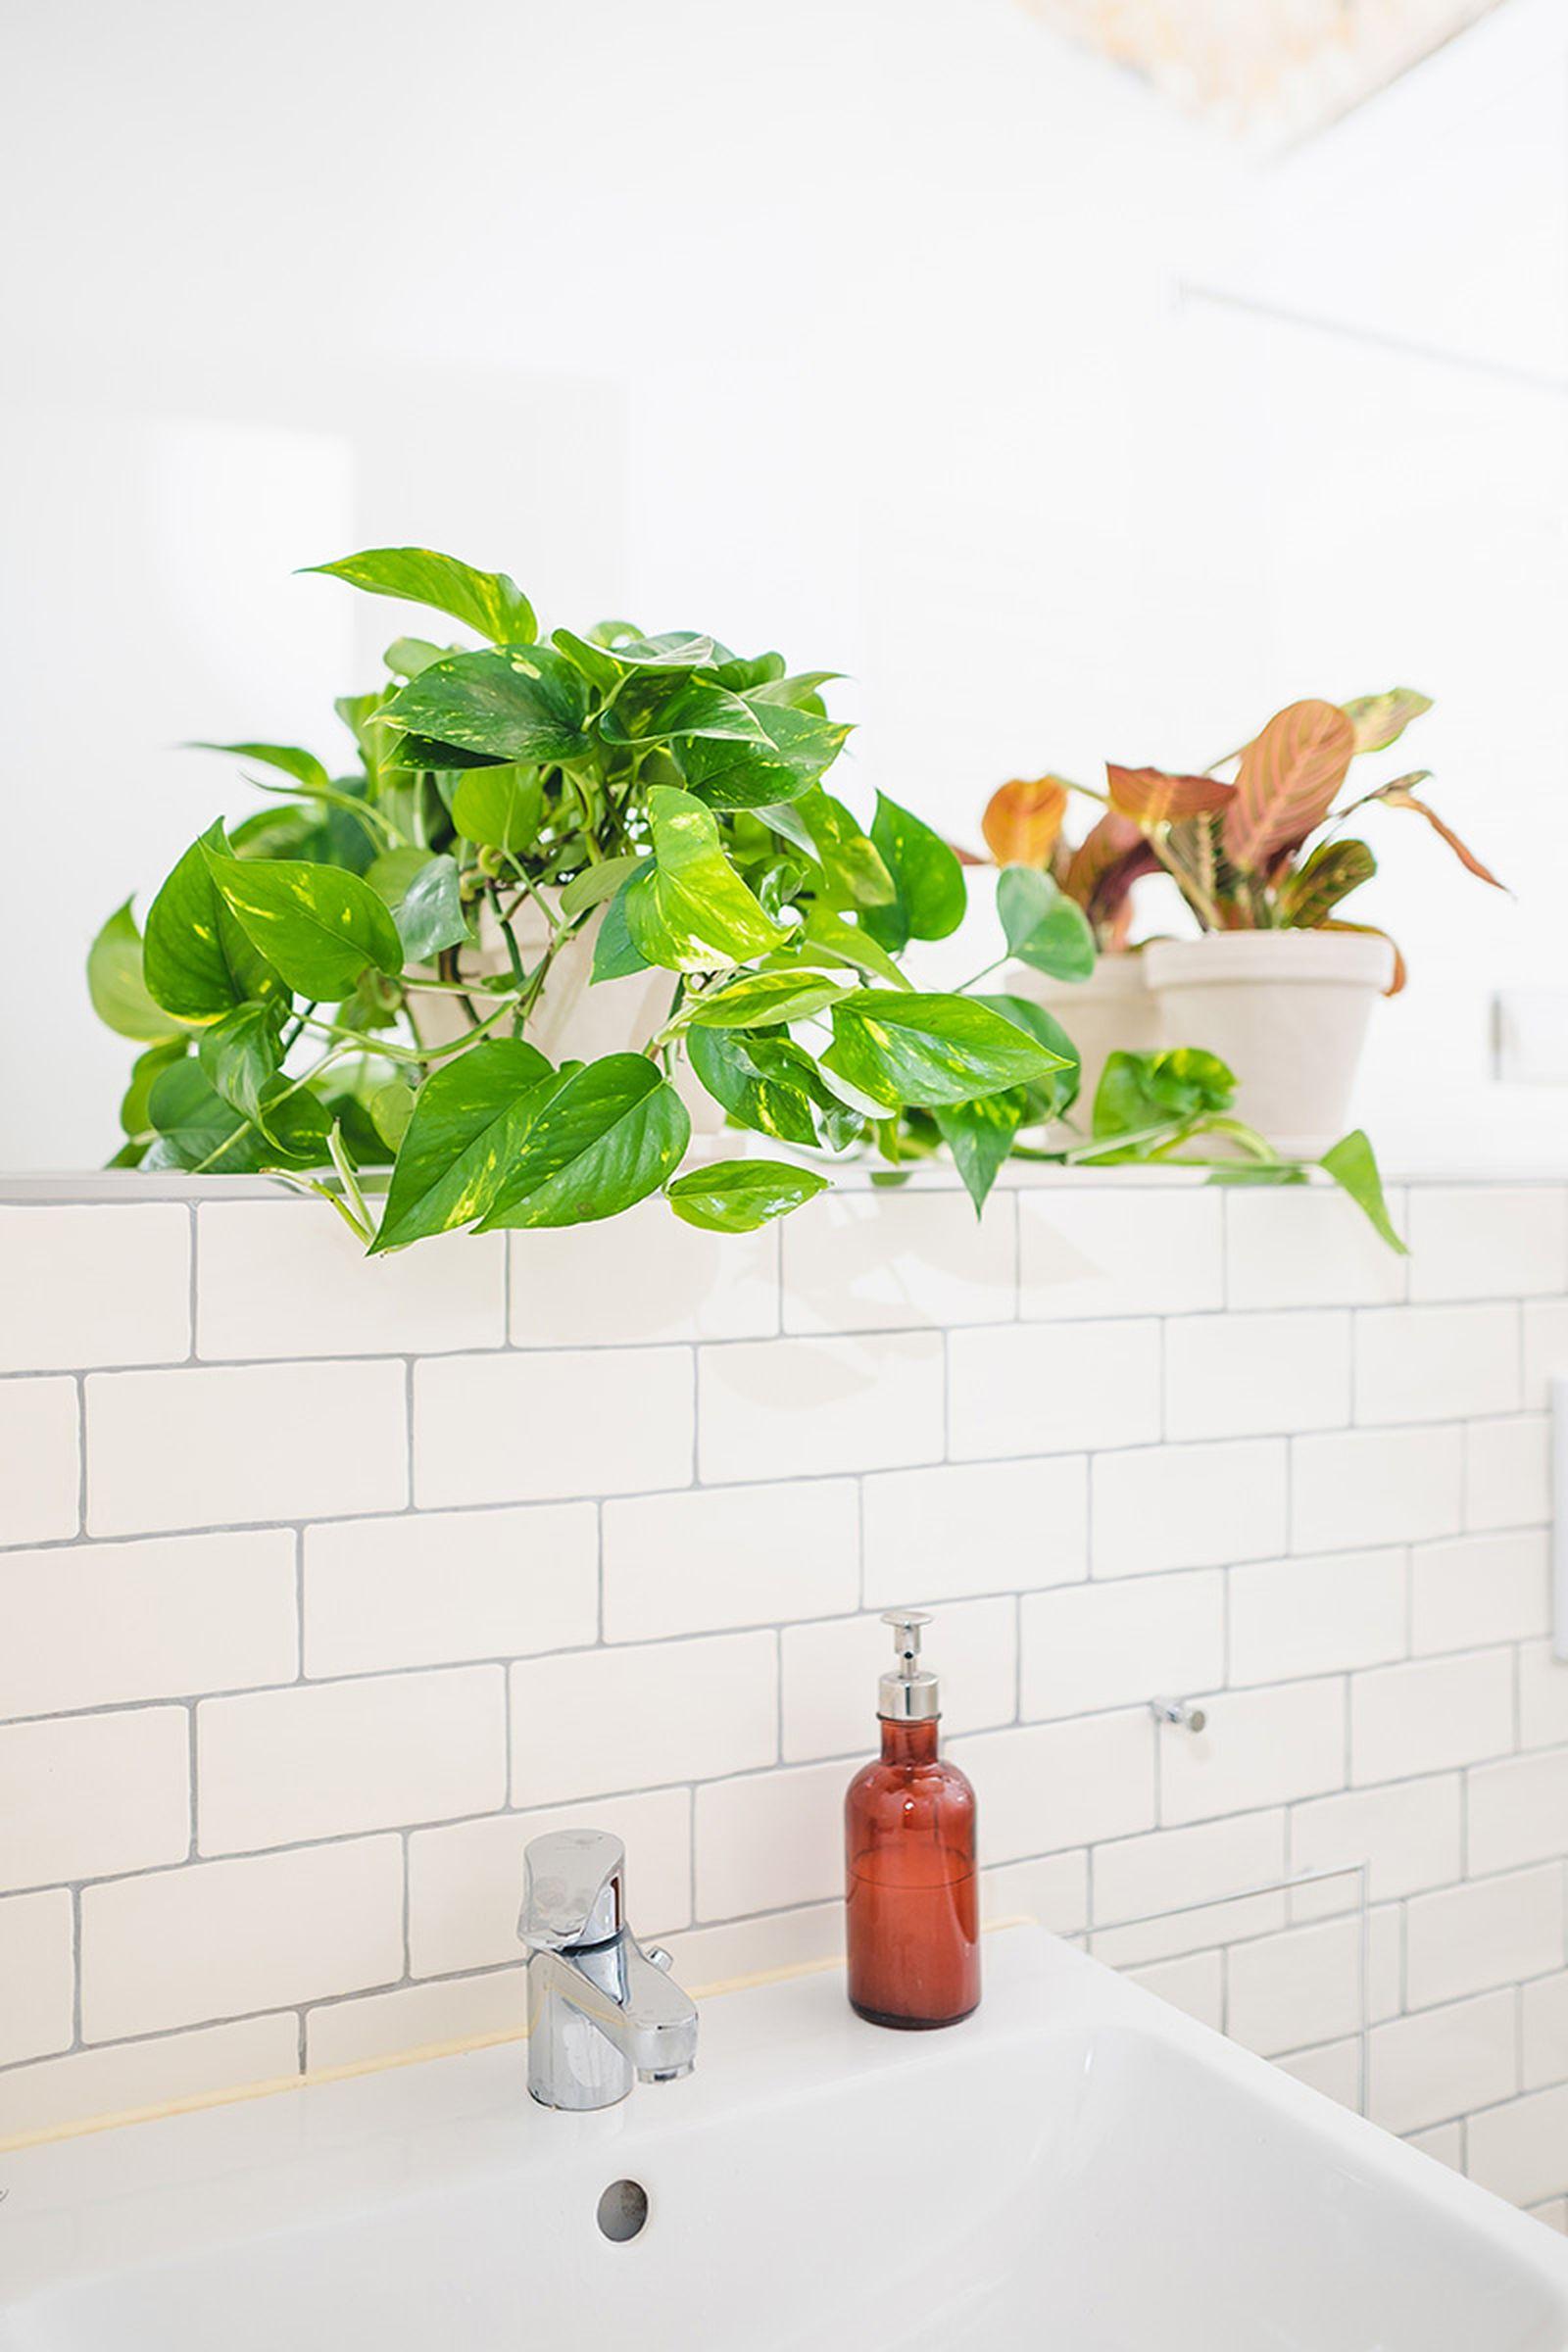 easy-house-plants-for-beginners-02